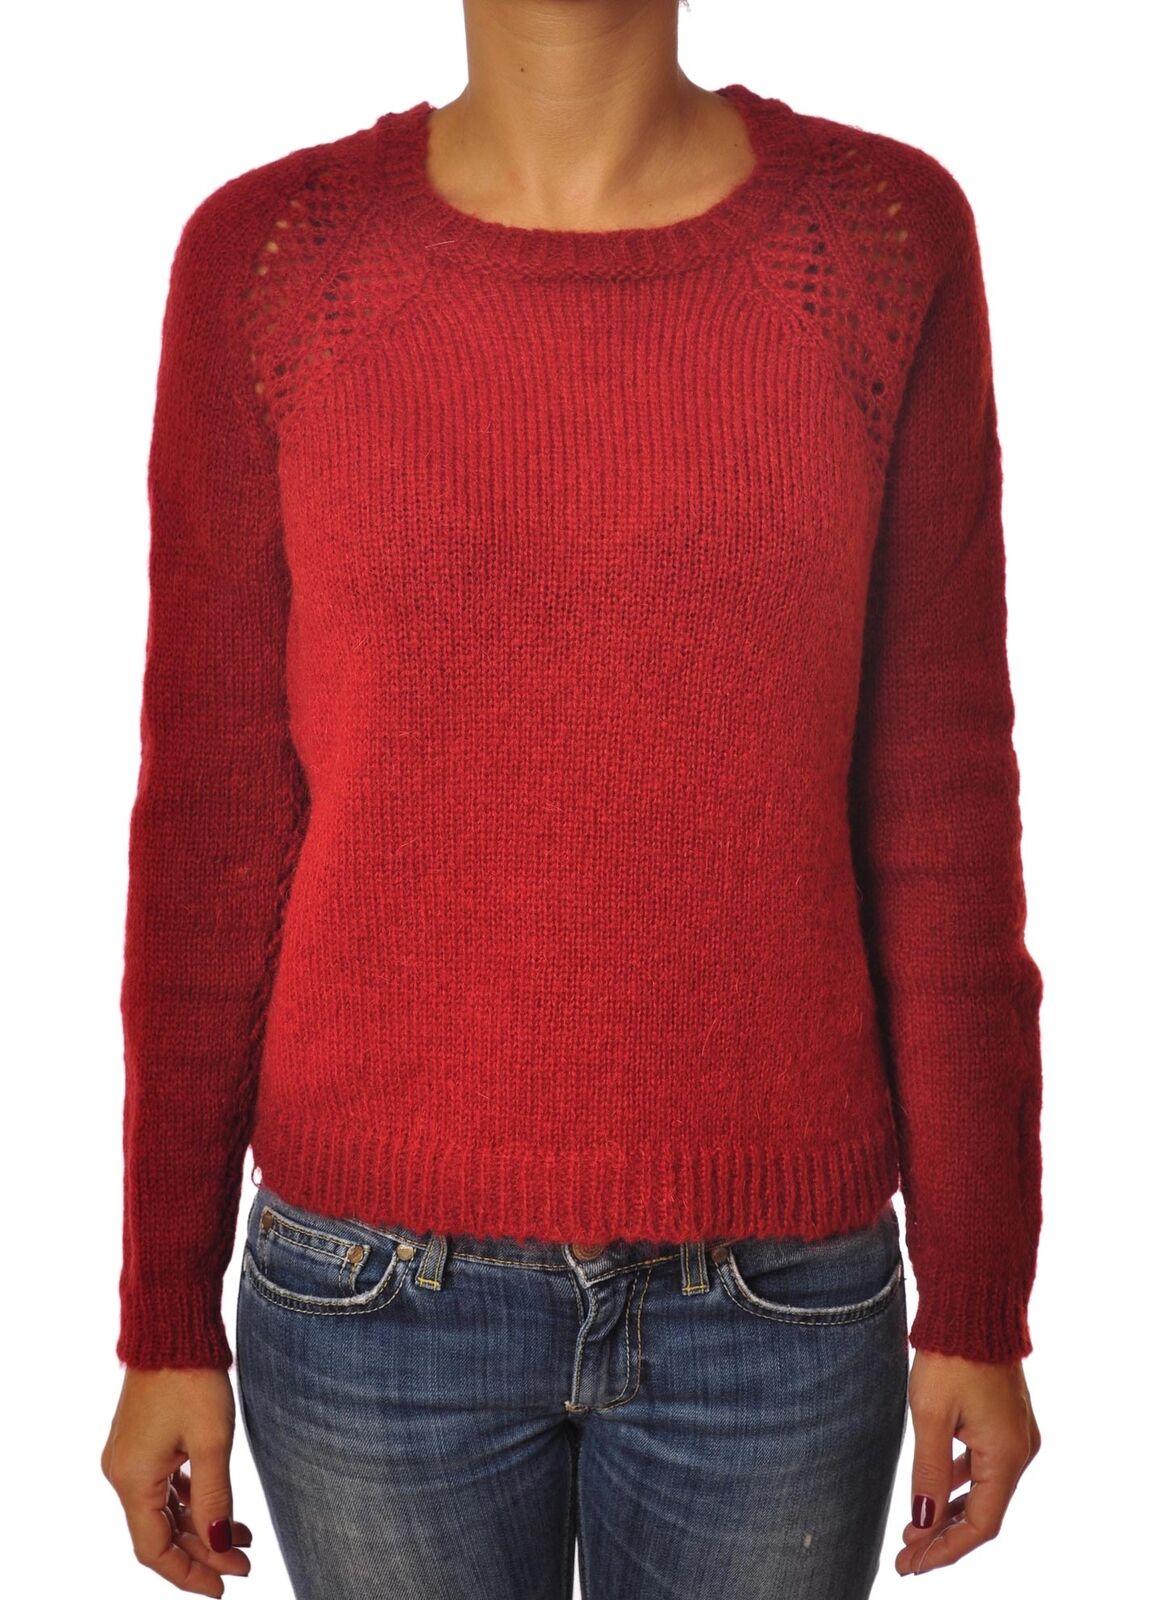 O.D.D.  -  Sweaters - Female - Red - 4267227A184710